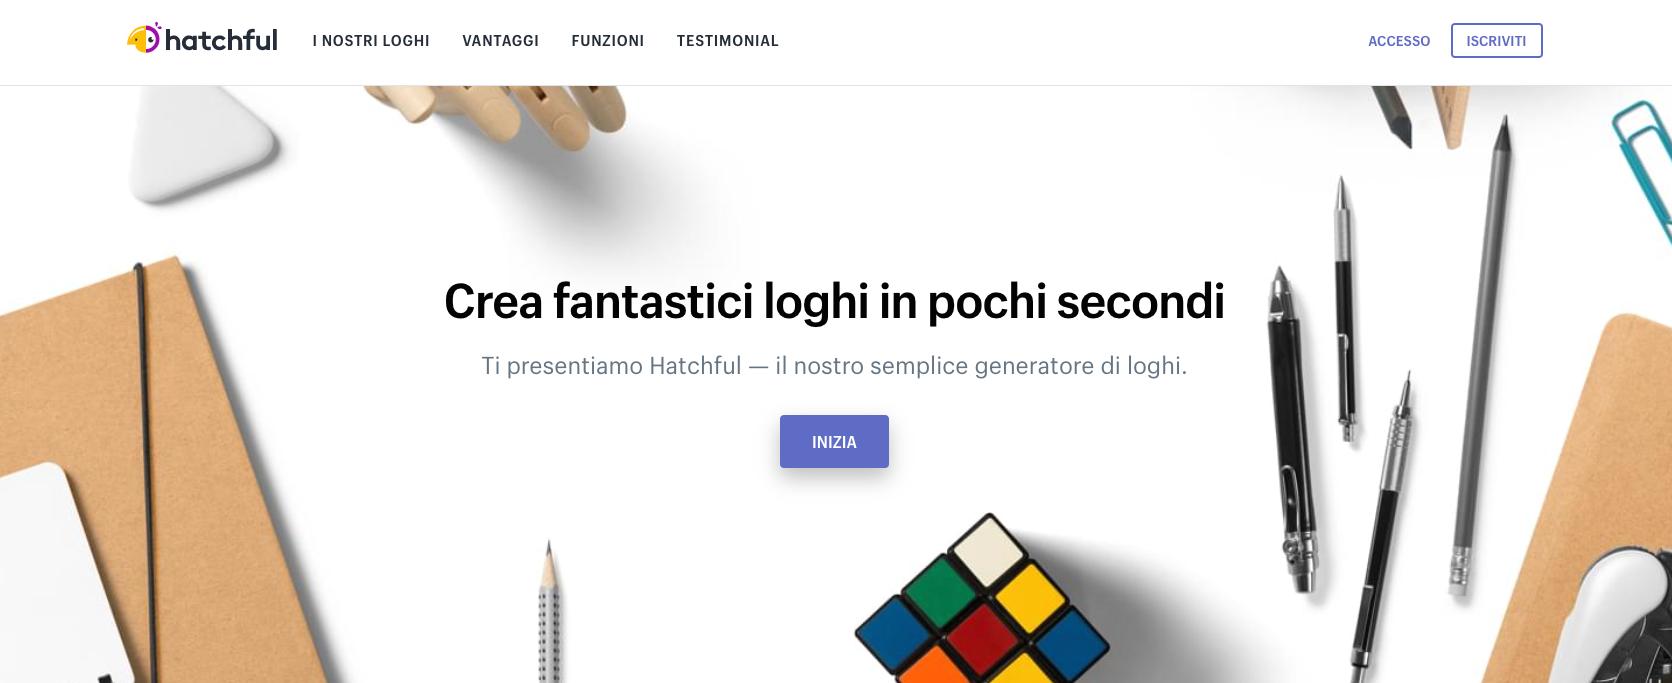 hatchful: come creare un logo